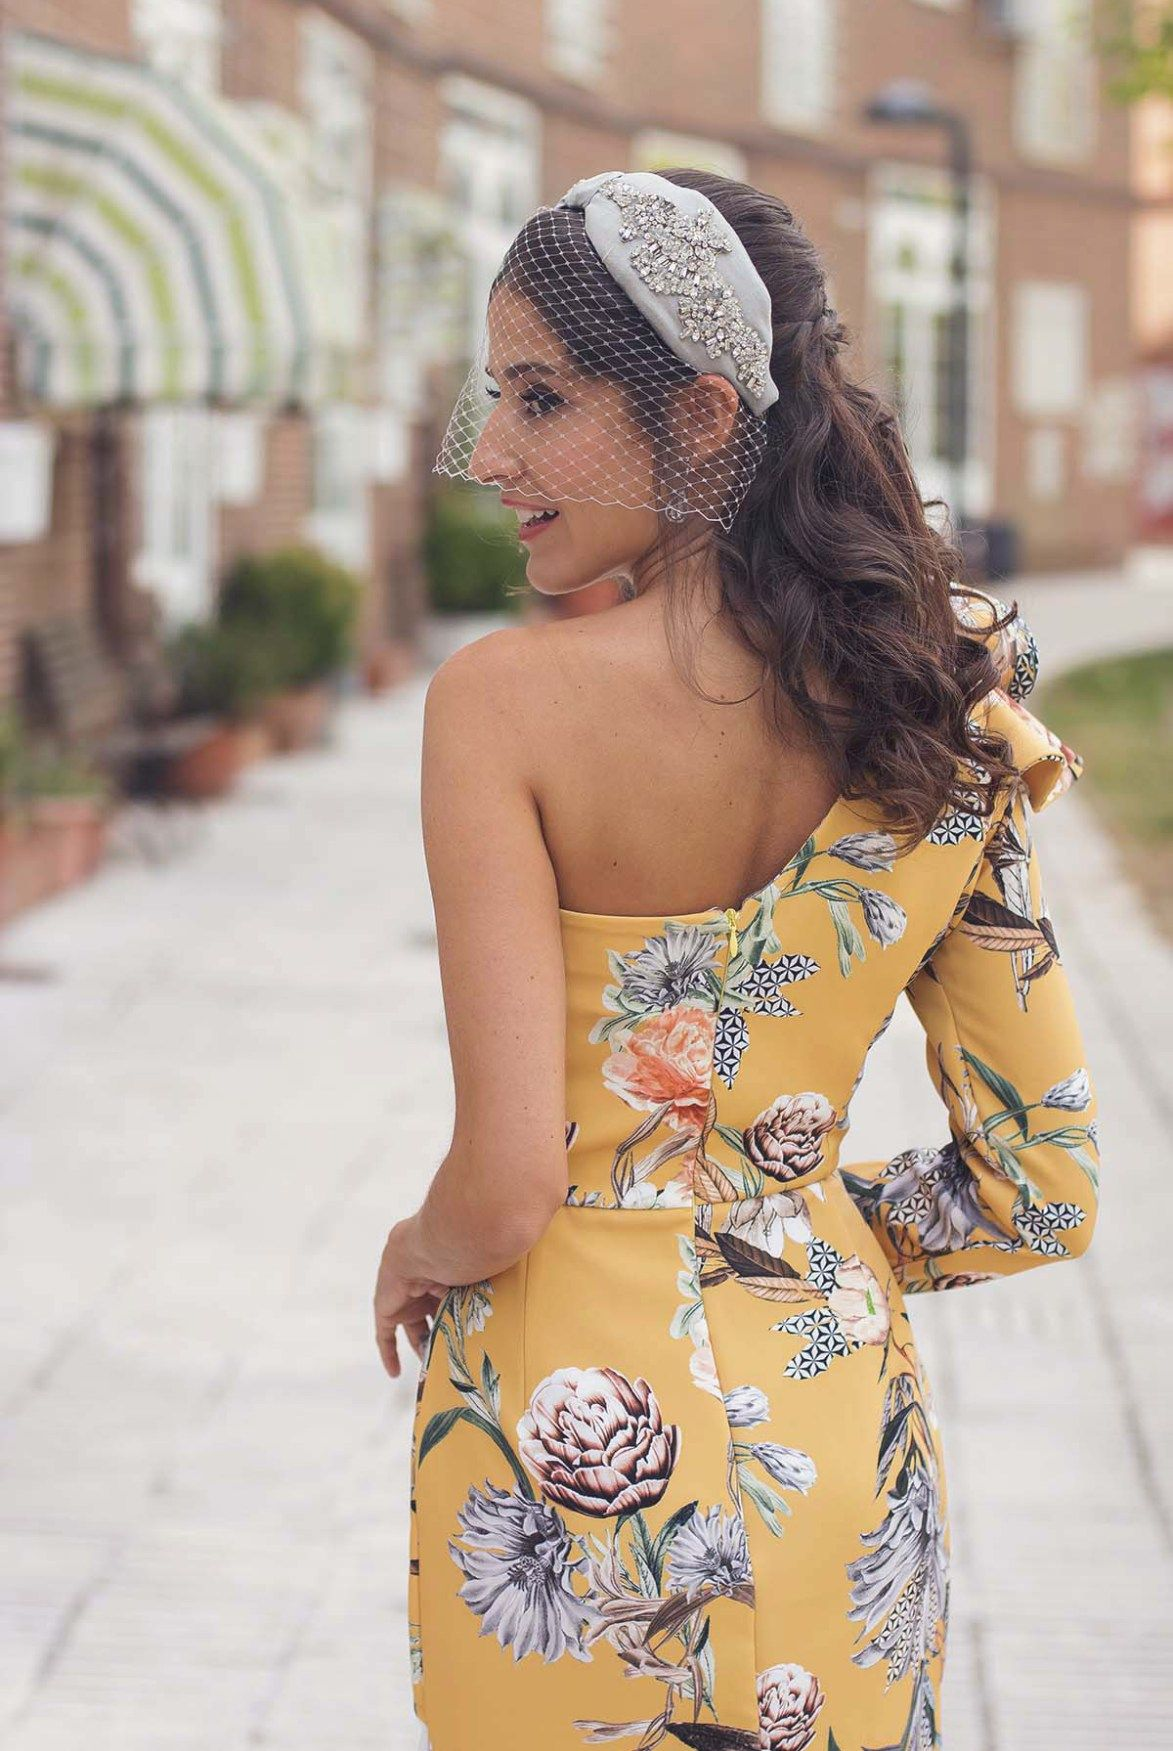 ab66adc2e Invitada boda de mañana vestido asimétrico estampado amarillo ...